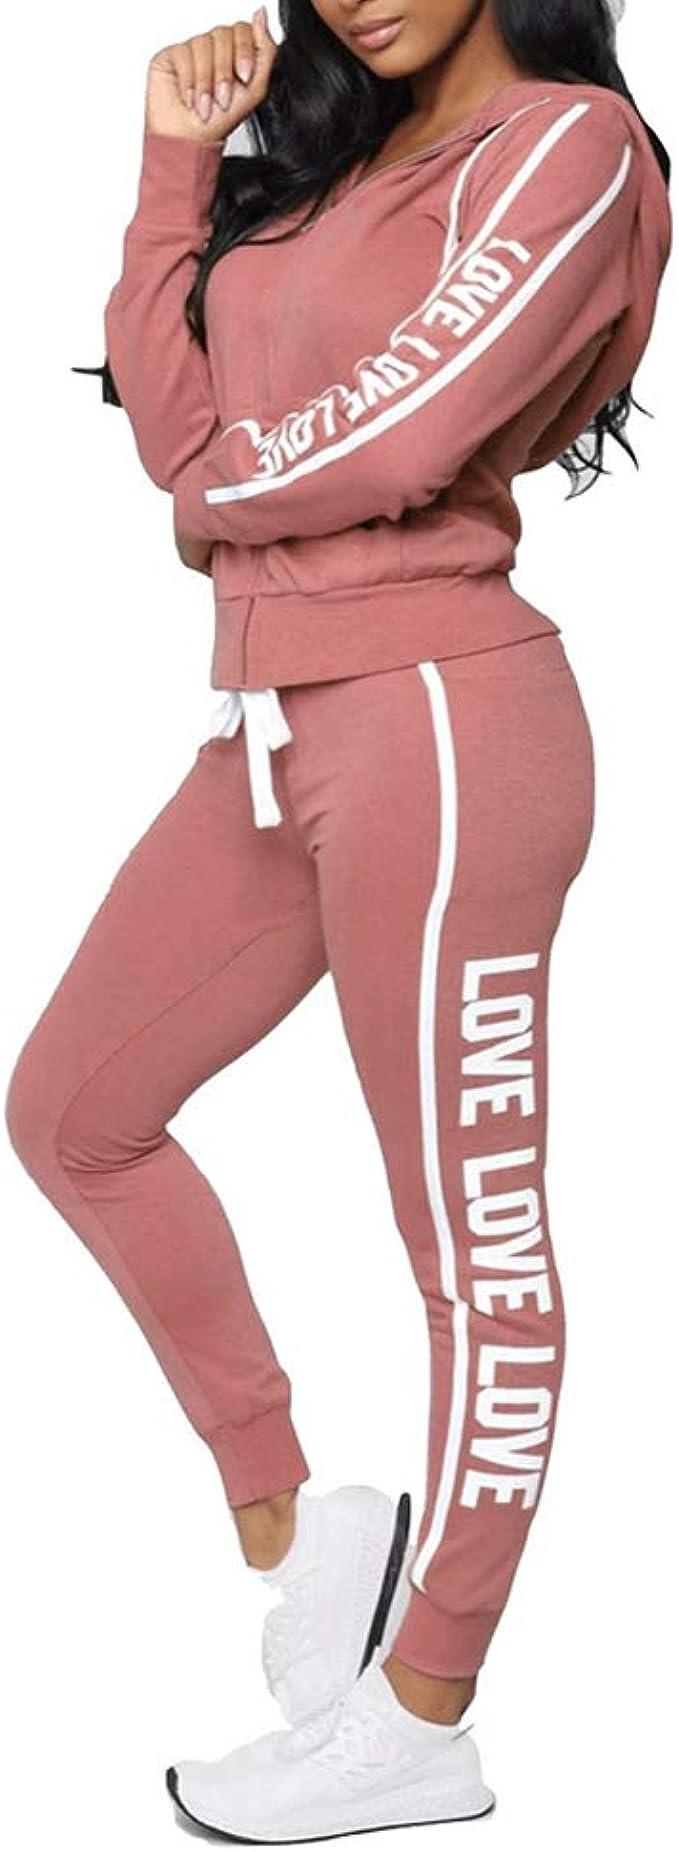 Godoboo Tuta da Ginnastica da Donna Tuta da Casa Tute Sportivo Senza Maniche da Donna Tuta da Jogging Pantaloni Sportivi con Coulisse e Tasche Set da 2 Pezzi Sport Yoga Outfit